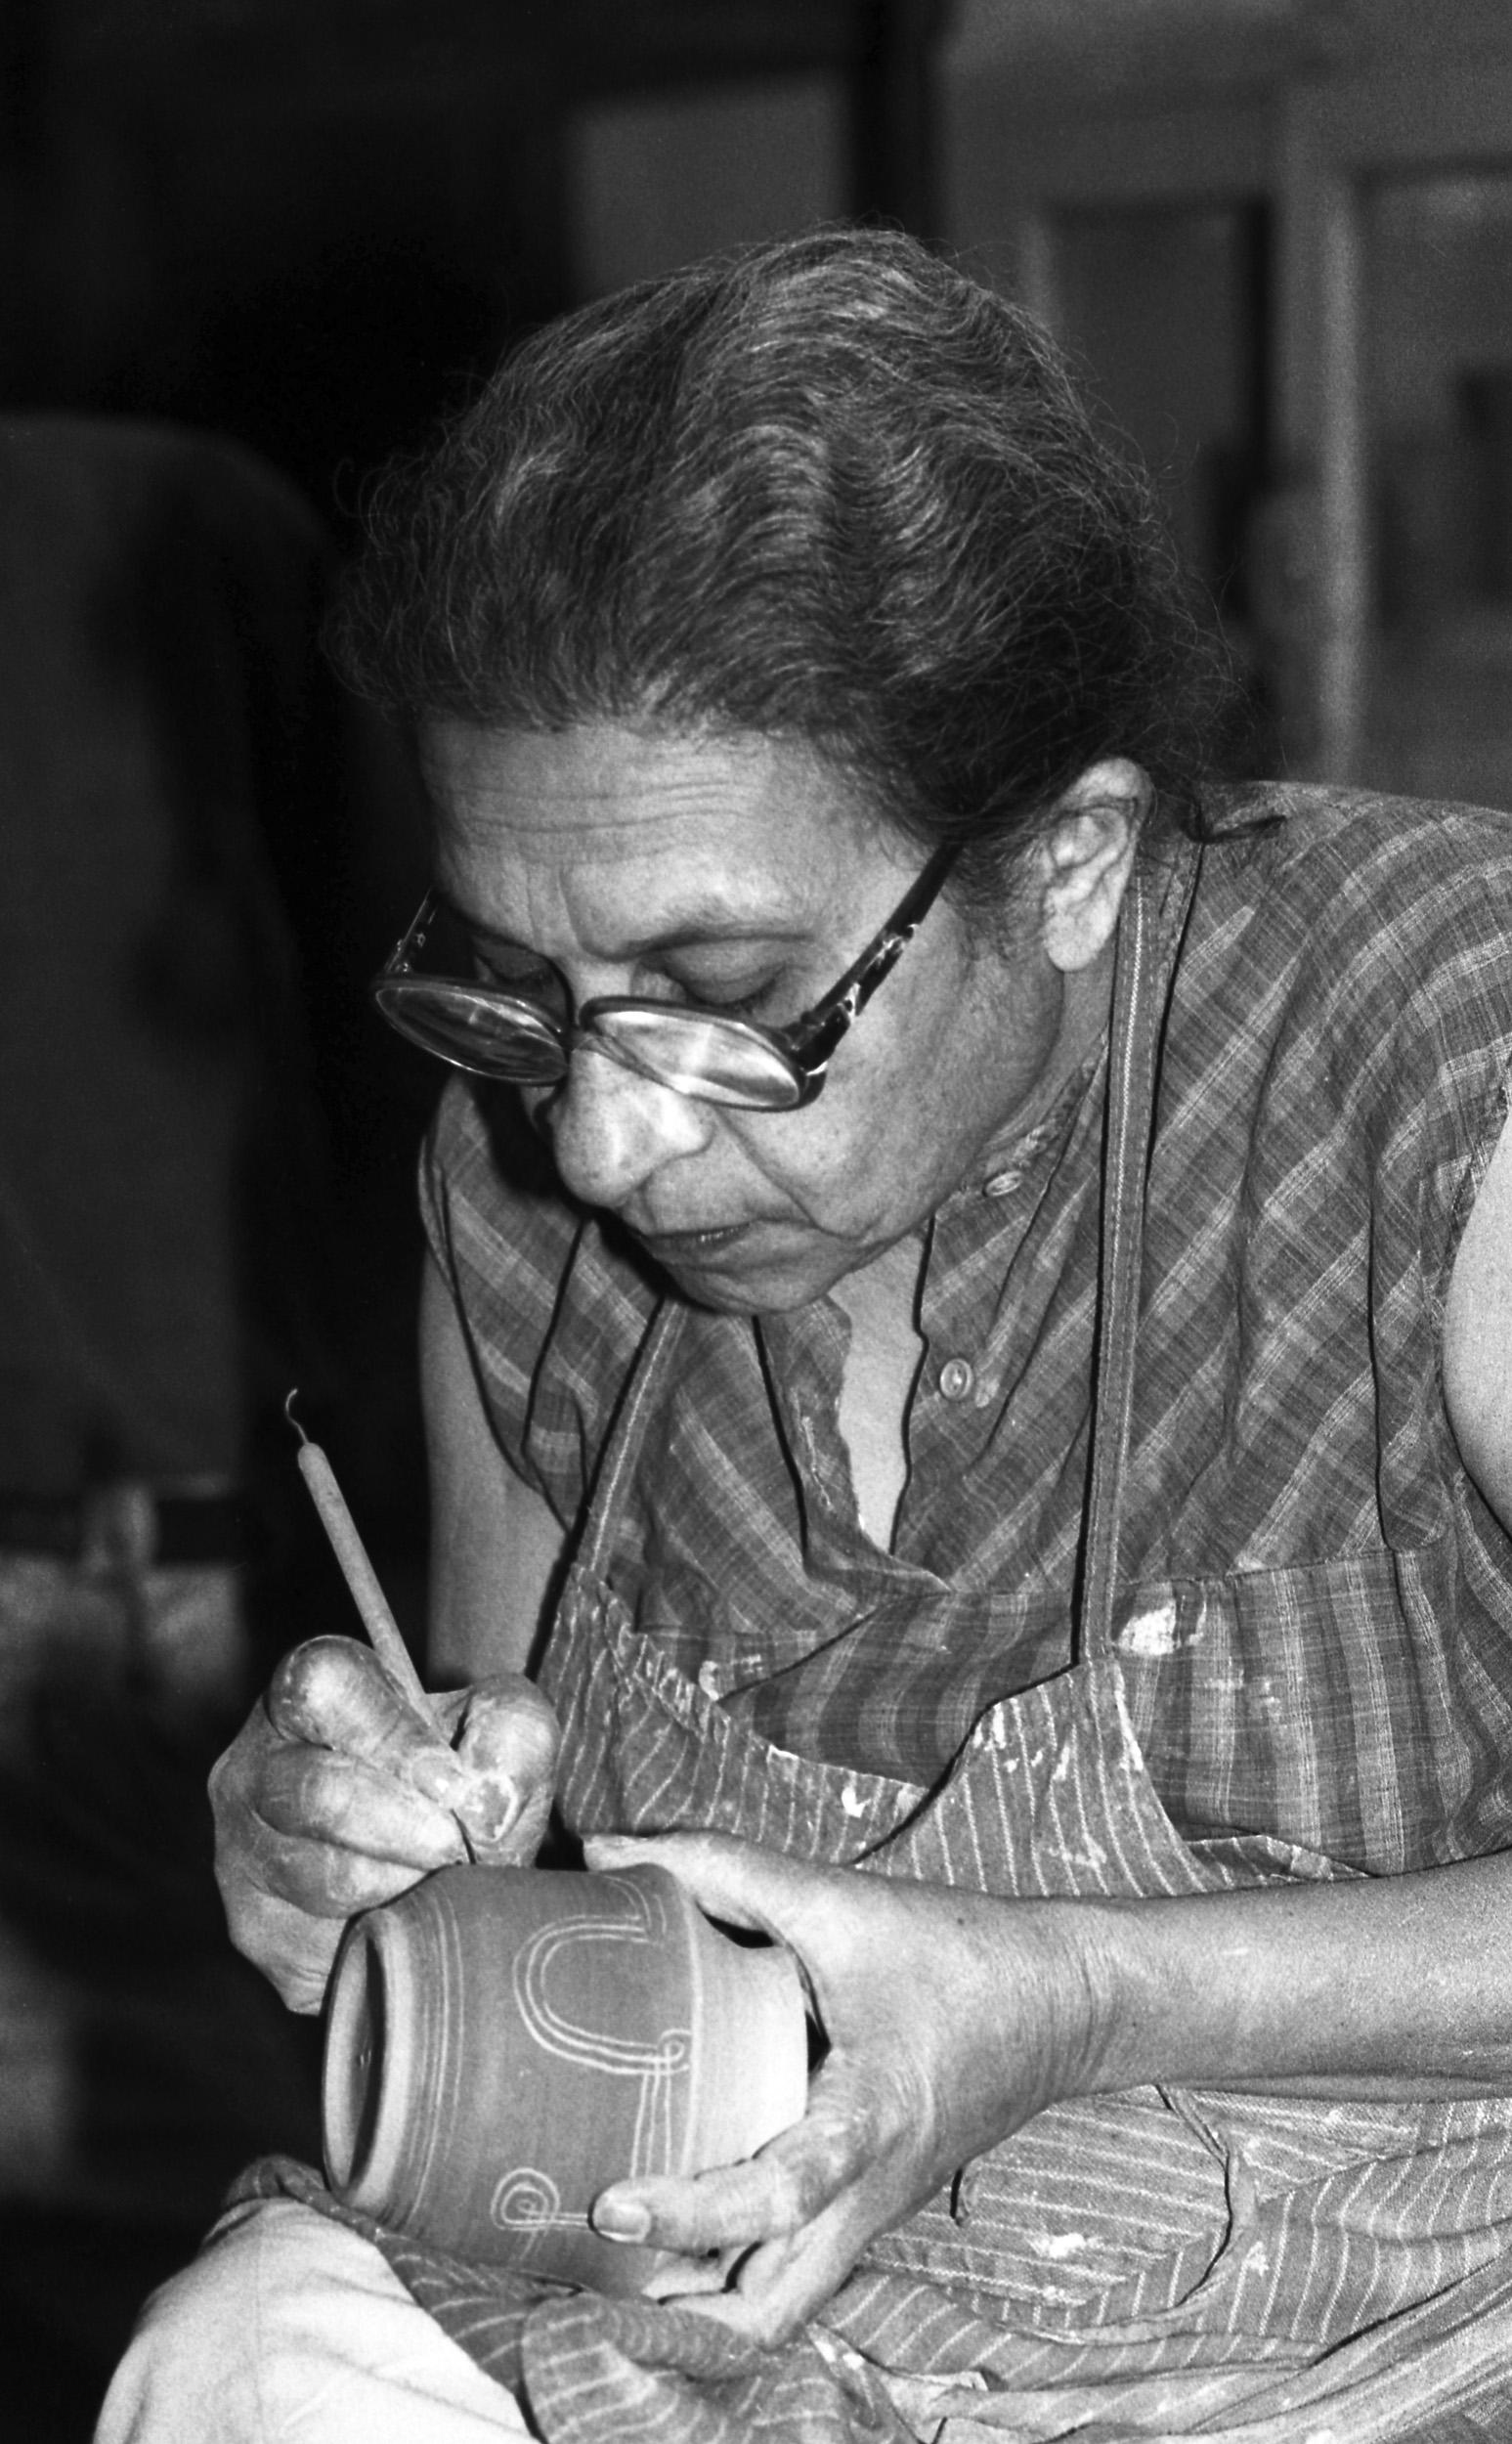 Ira Chaudhuri